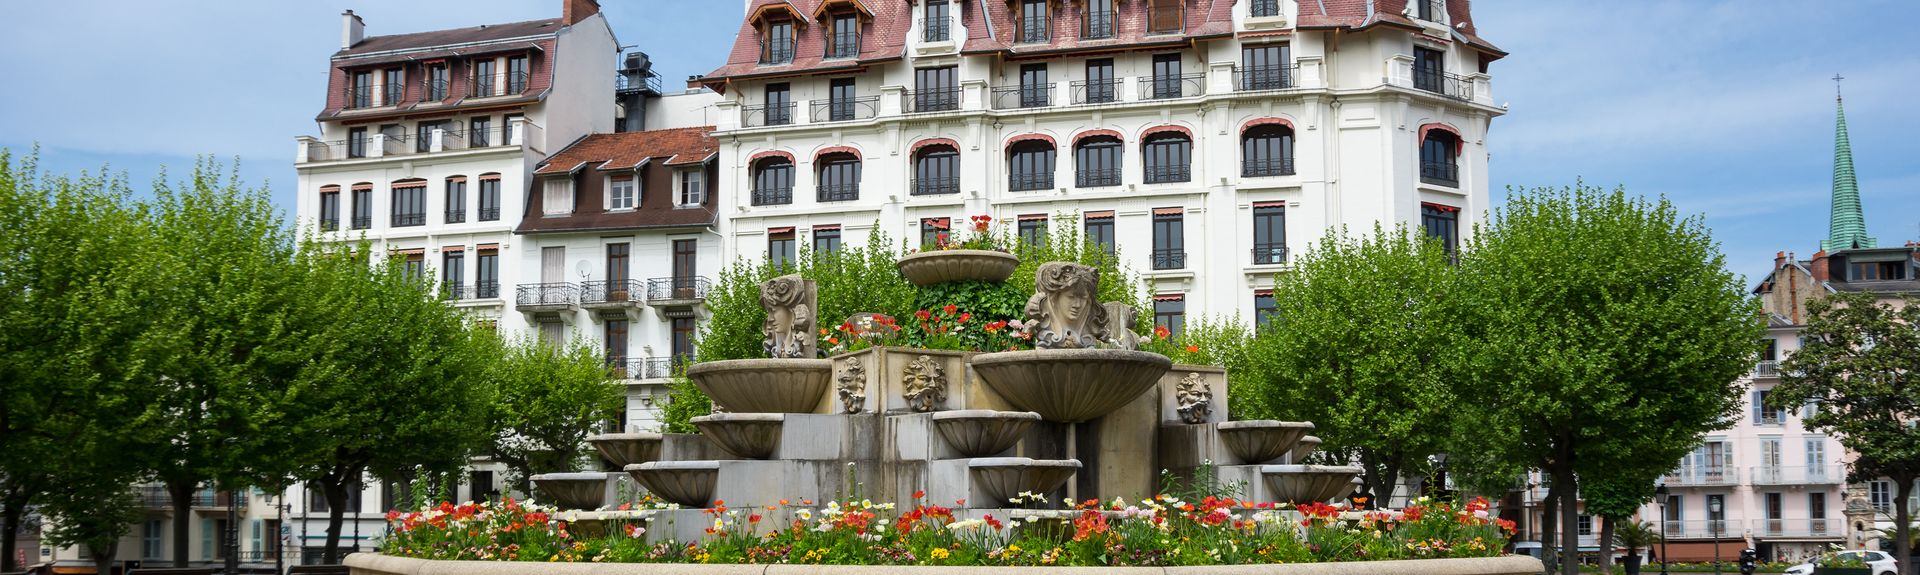 Aix les Bains, Rhône-Alpes, Francia